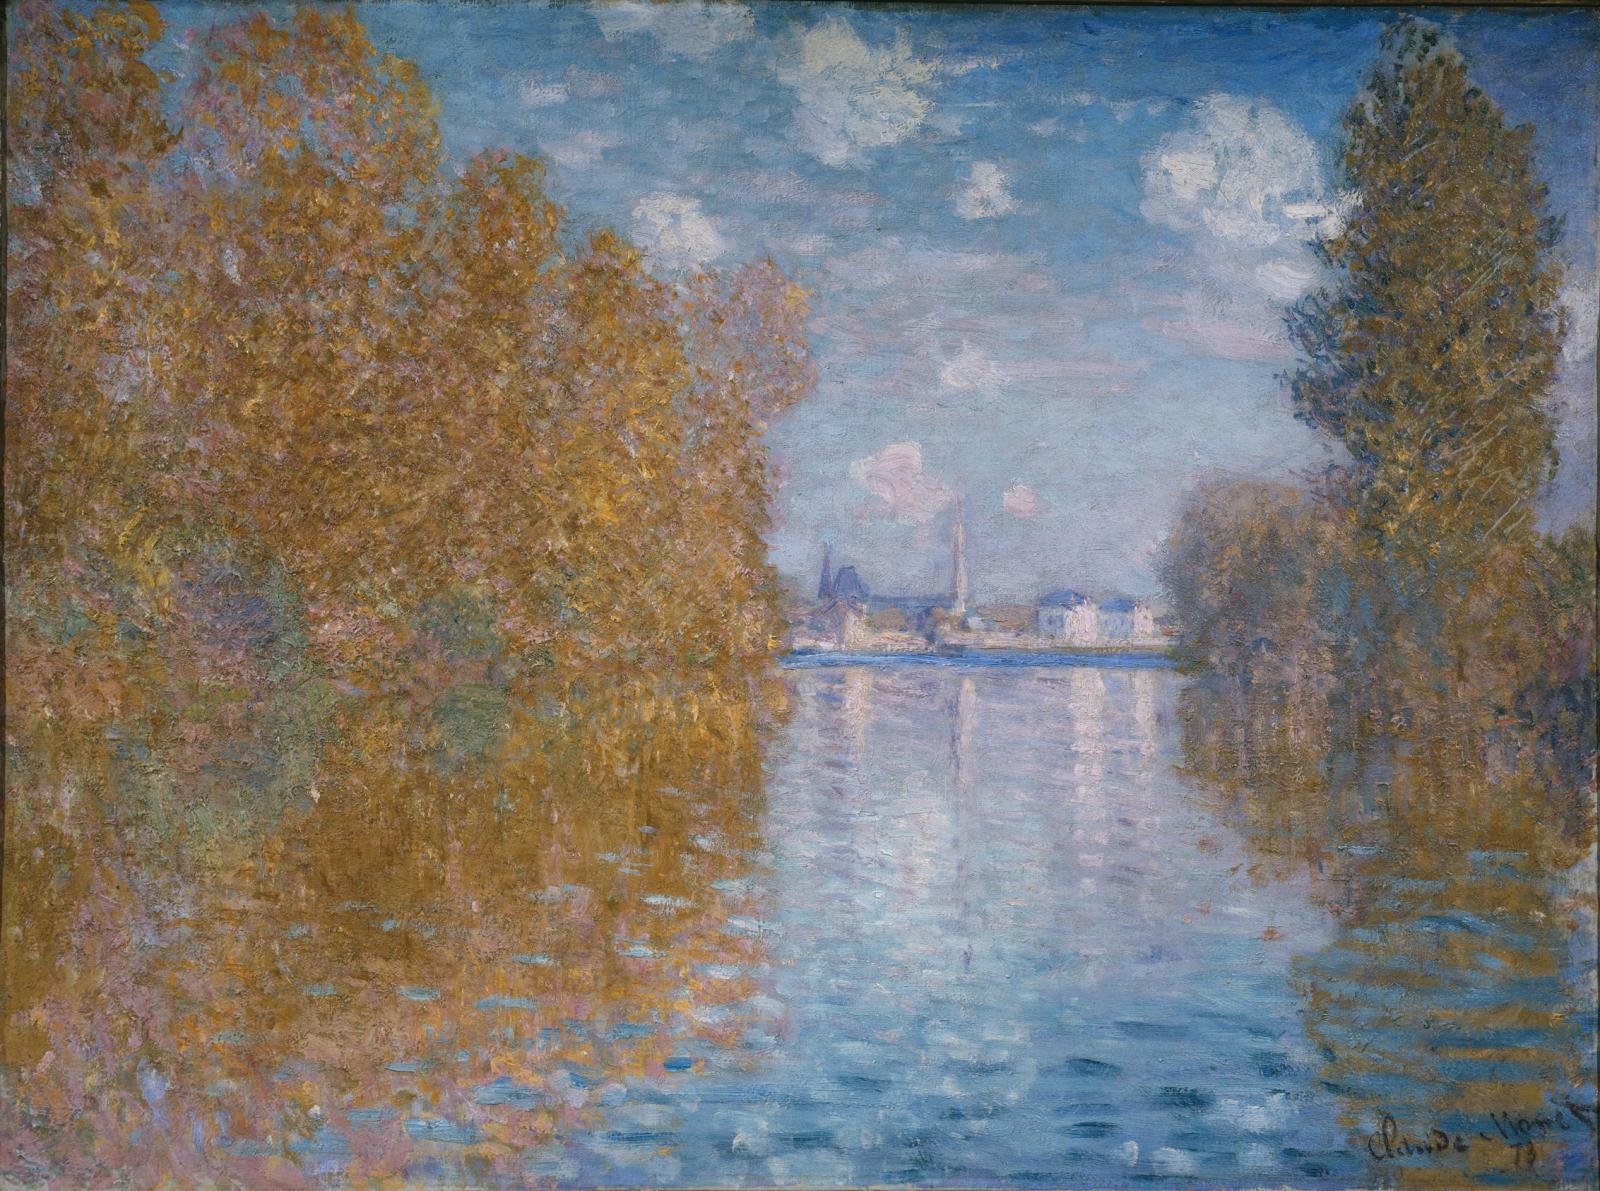 Claude Monet (1840-1926), Autumn Effect at Argenteuil, 1873, @The Samuel Courtauld Trust, The Courtauld Gallery, London.